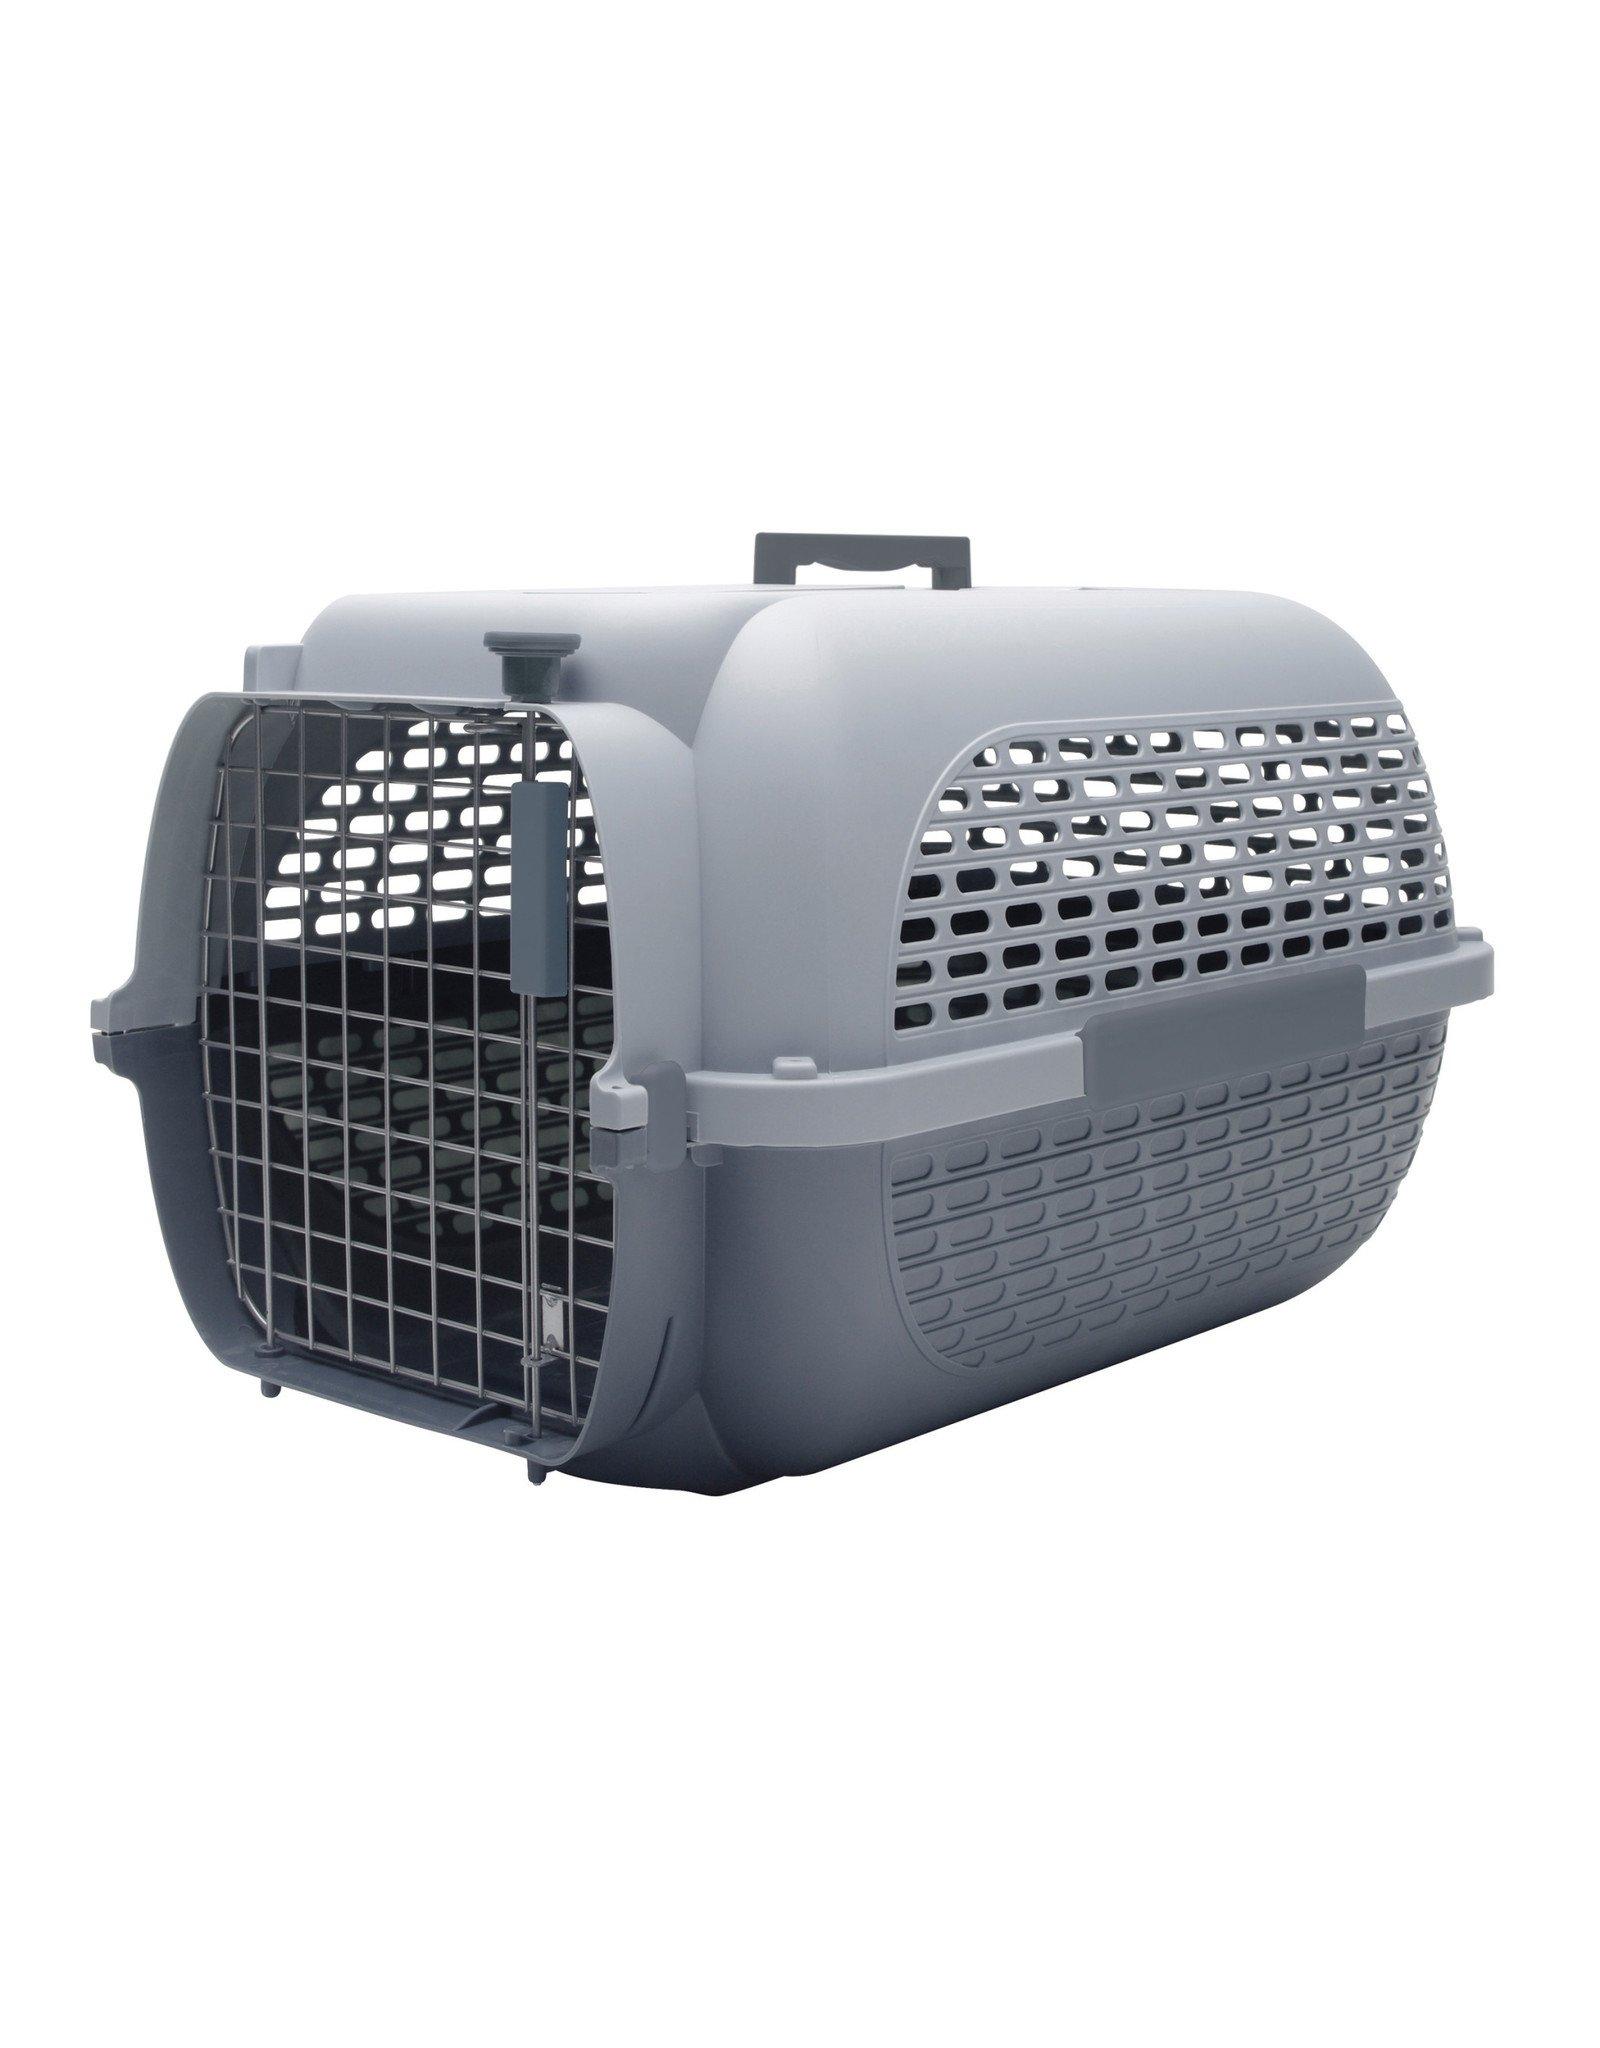 "DogIt Voyageur Dog Carrier Gray/Gray Small 48.3L x 32.6W x 28cmH (19x12.8x11"")"